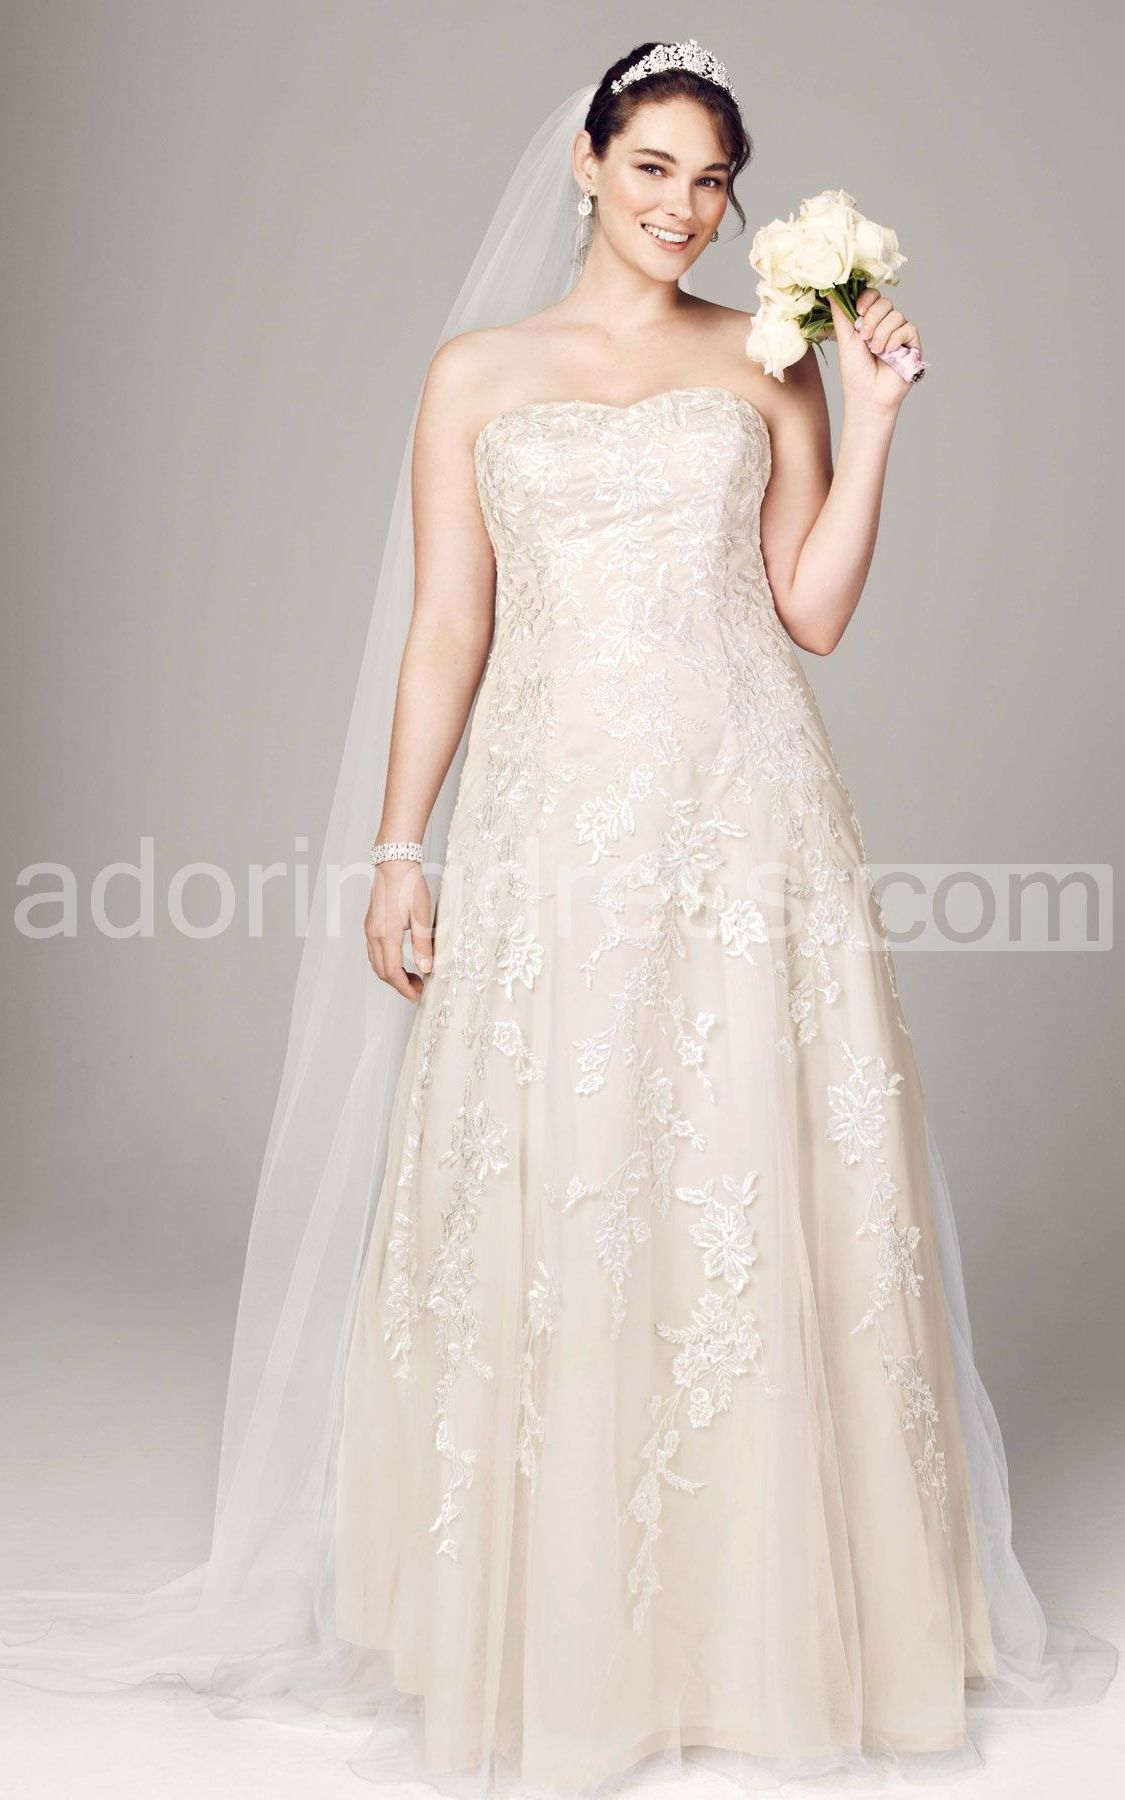 David wedding dress  Pin by Mary Sharon on Wedding Dresses Plus Size  Pinterest  Tulle